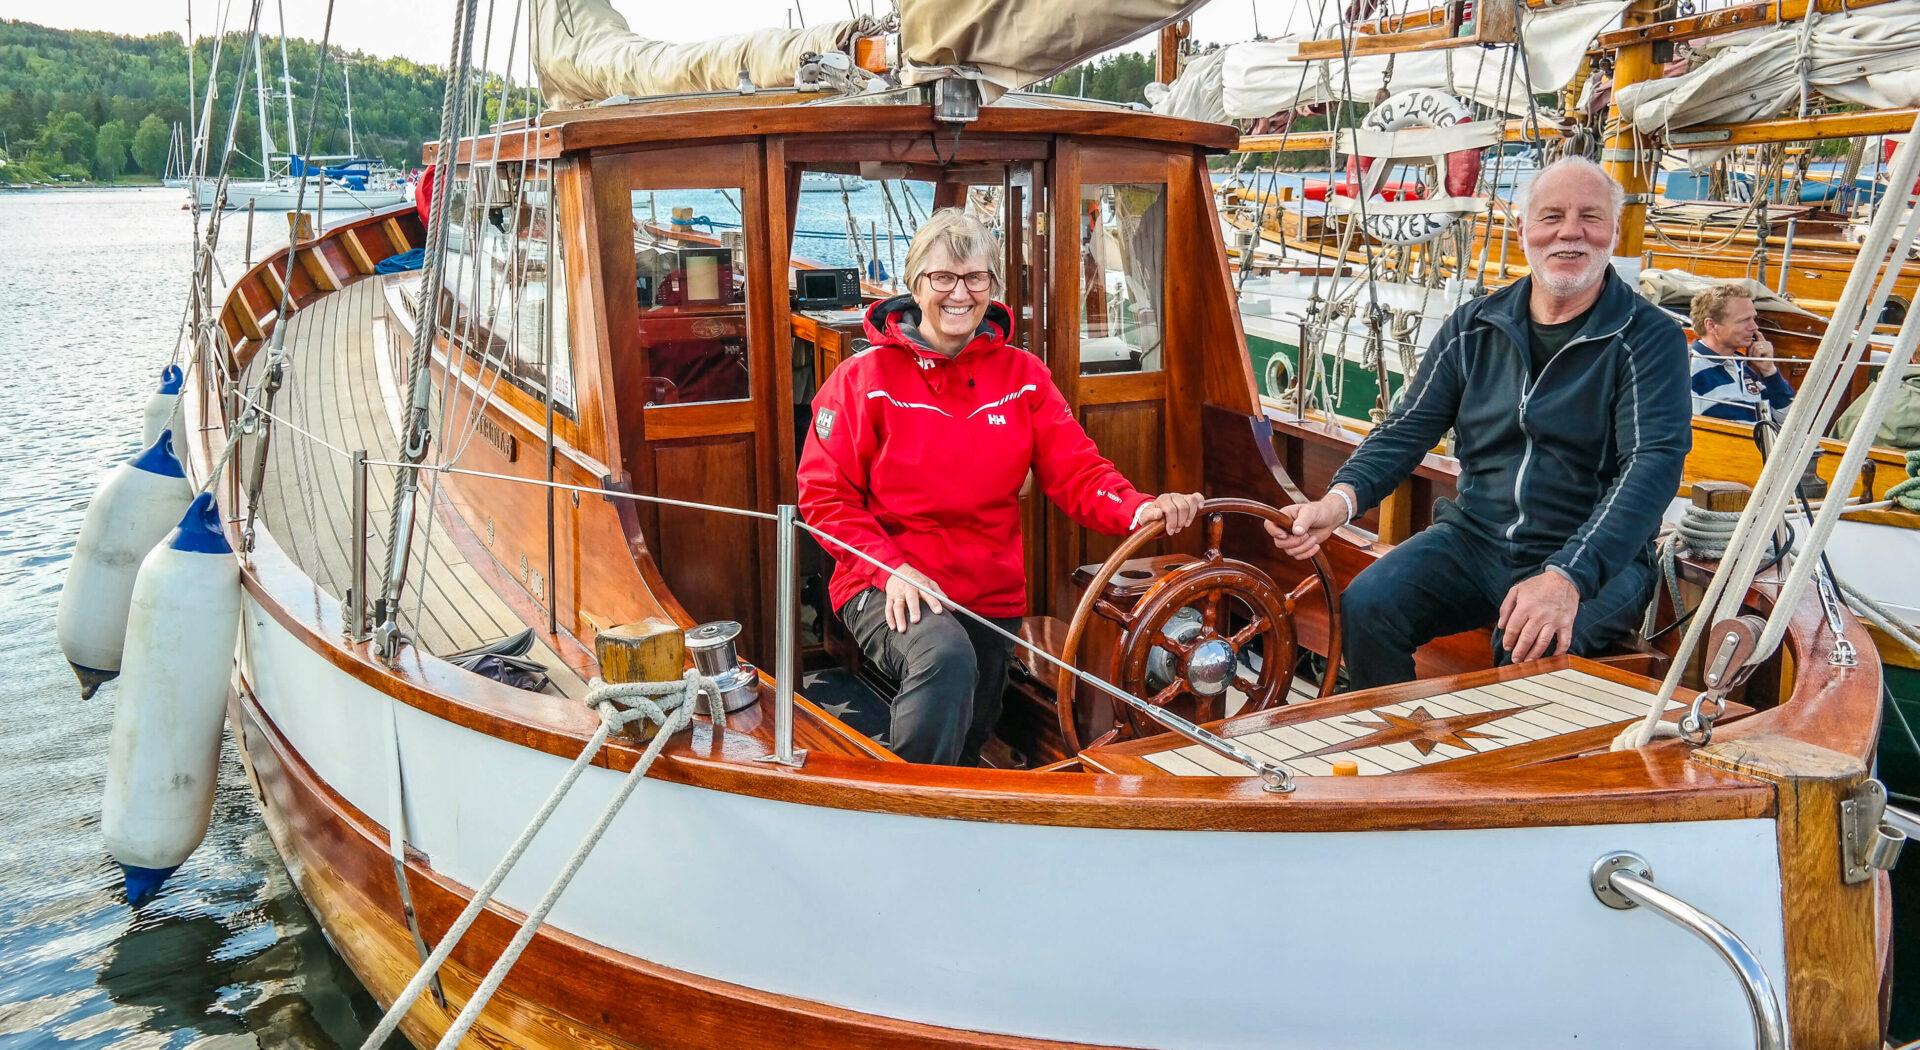 Trebåt Familien Stensen med båt_red